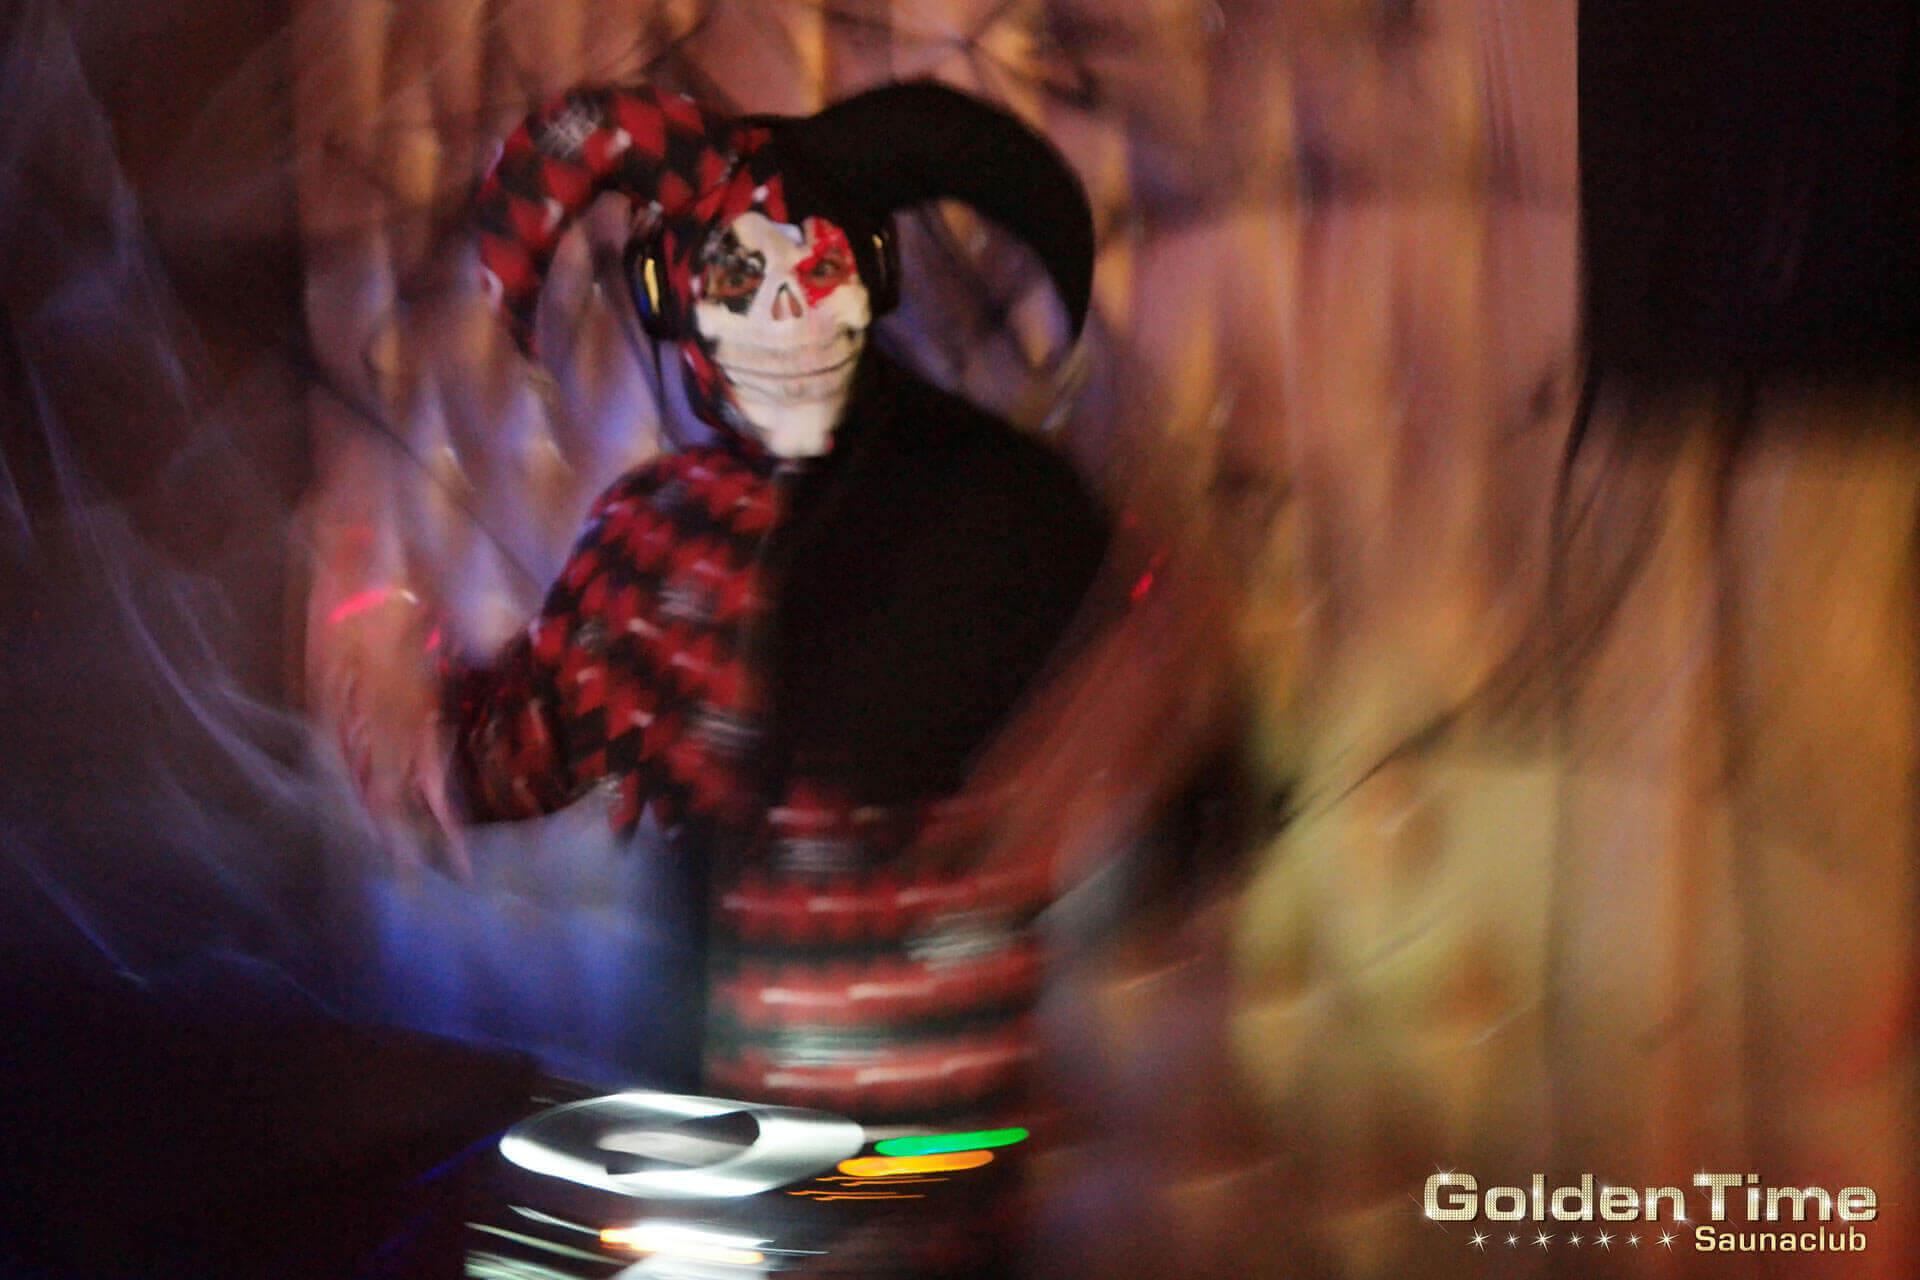 03-halloween-2016-goldentime-saunaclub-29.jpg